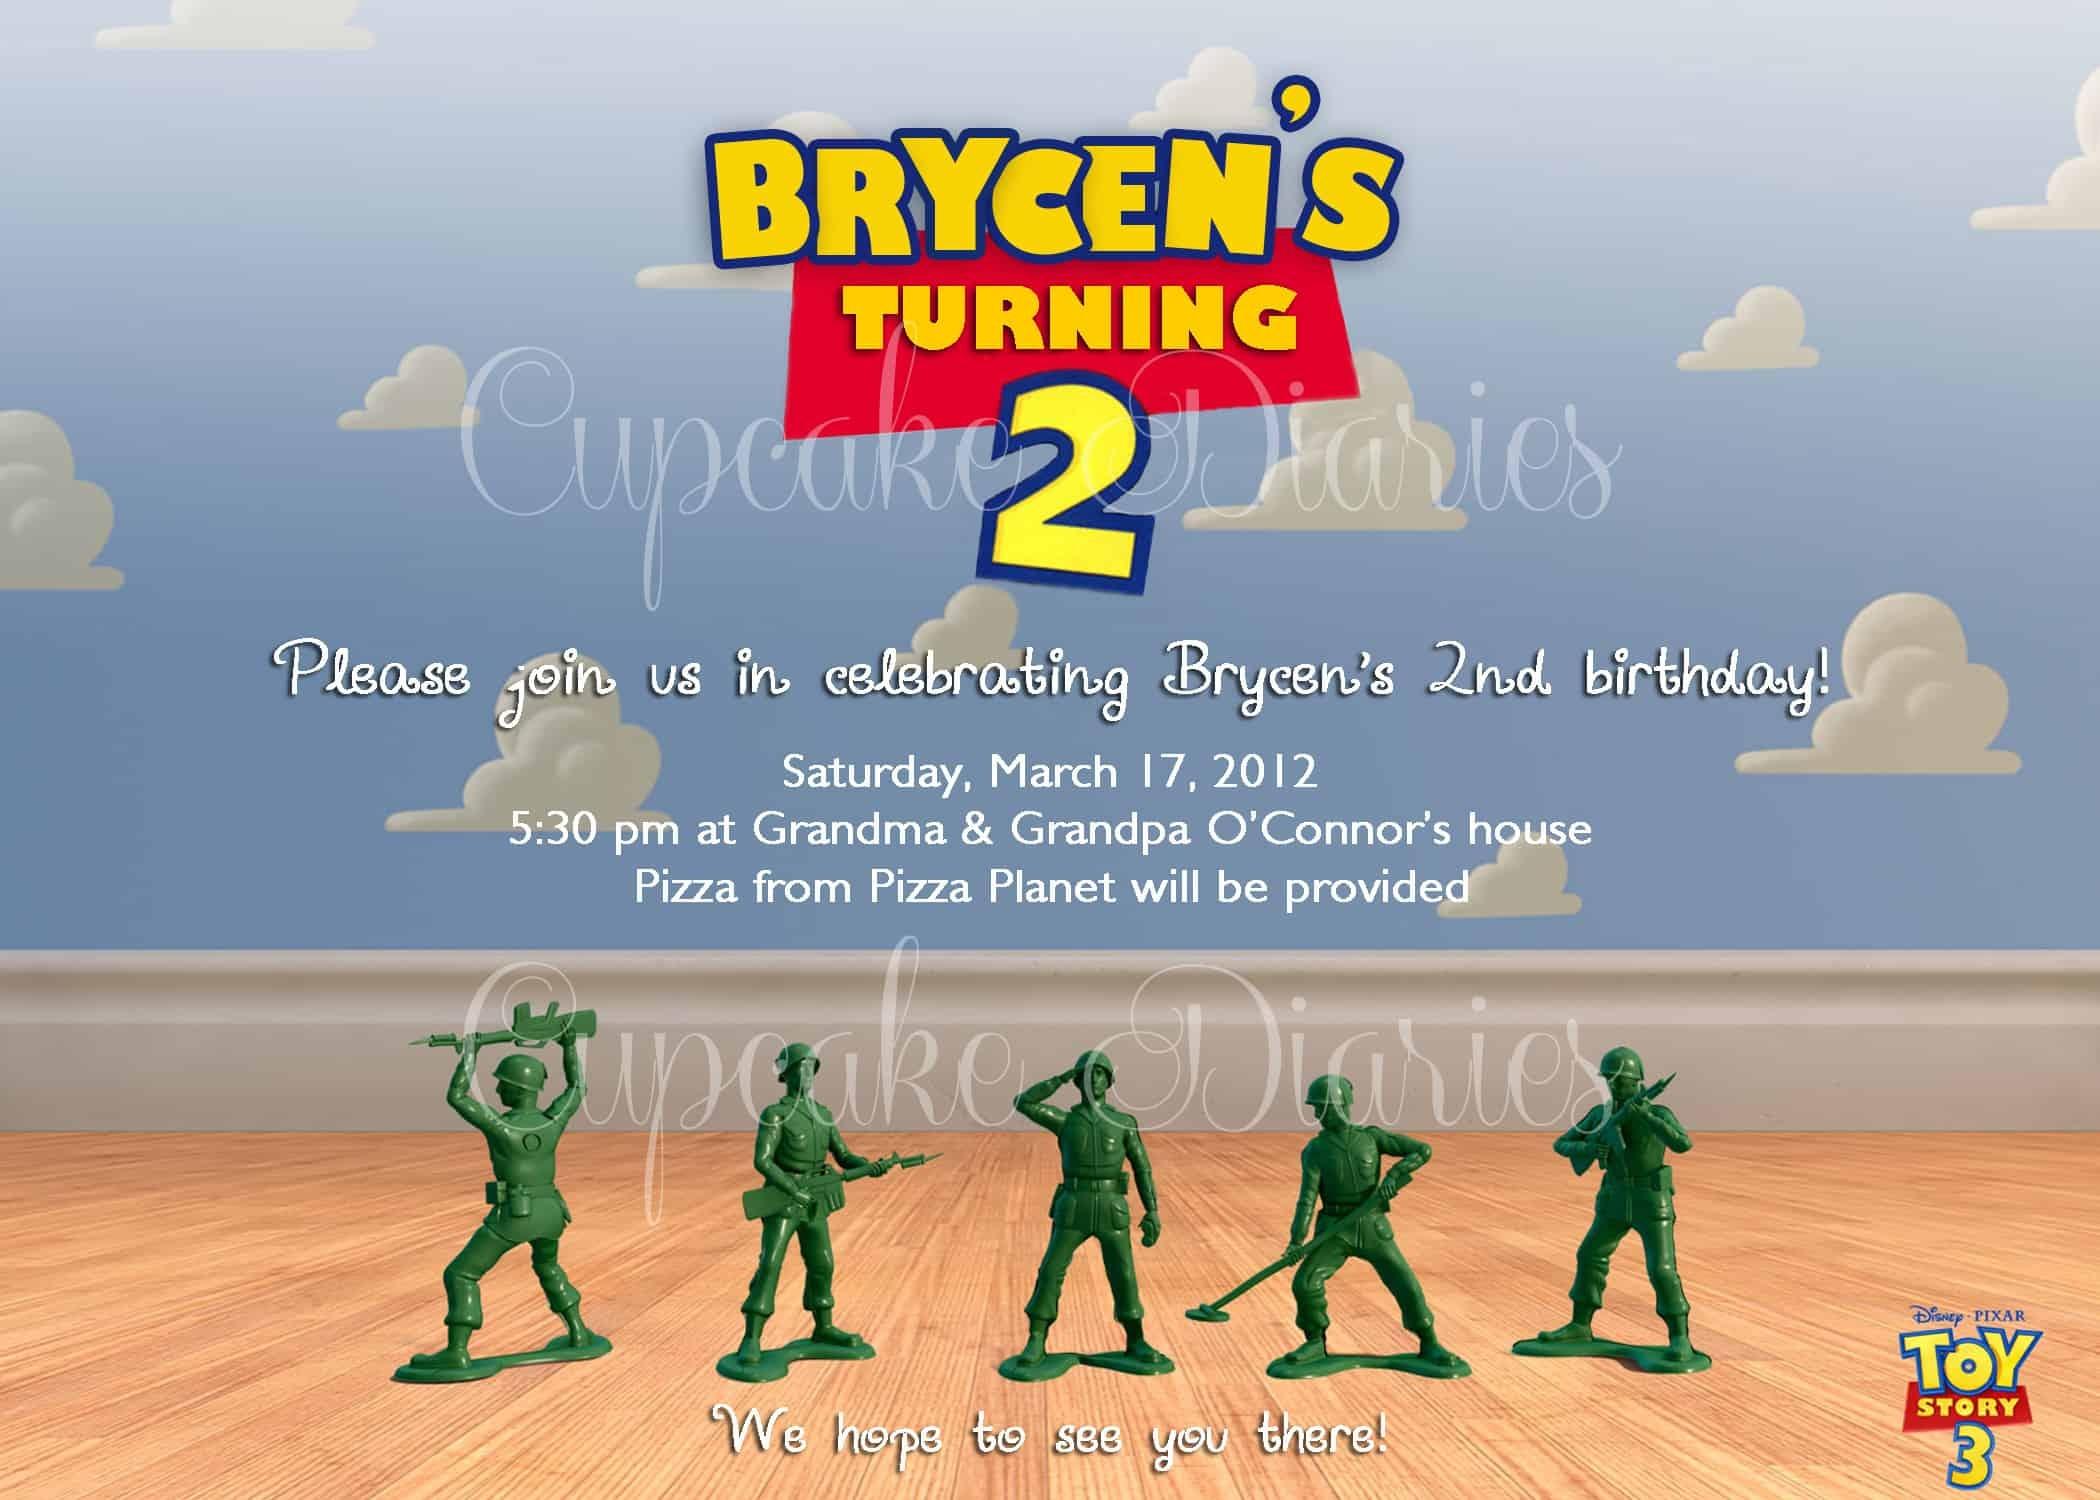 Toy Story 3 Birthday Party - Cupcake Diaries - Free Printable Toy Story 3 Birthday Invitations